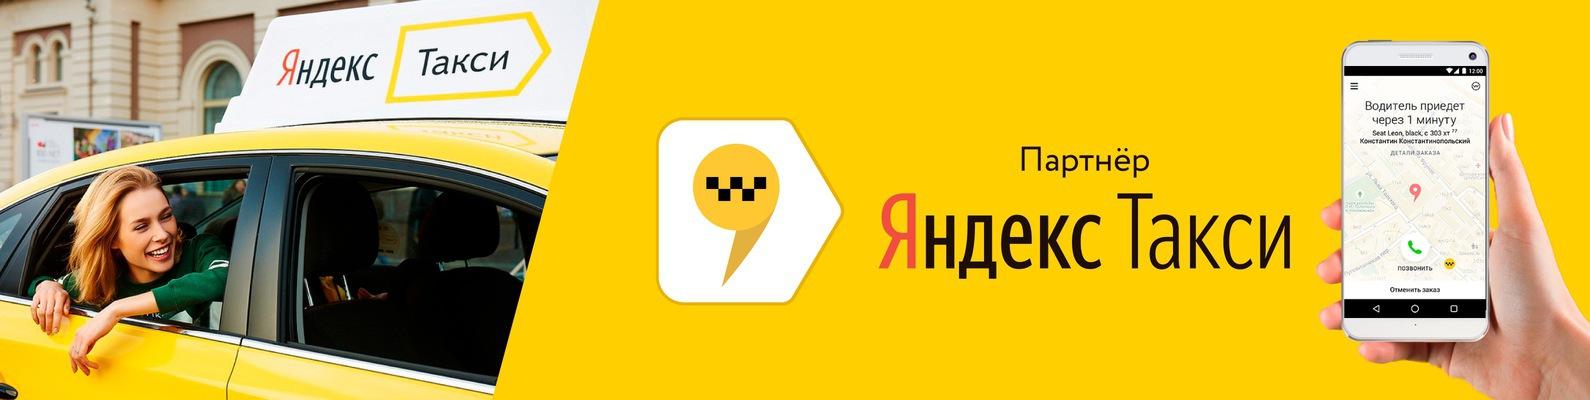 Yandeks Taksi Partner Ambassador Cheboksary Vkontakte